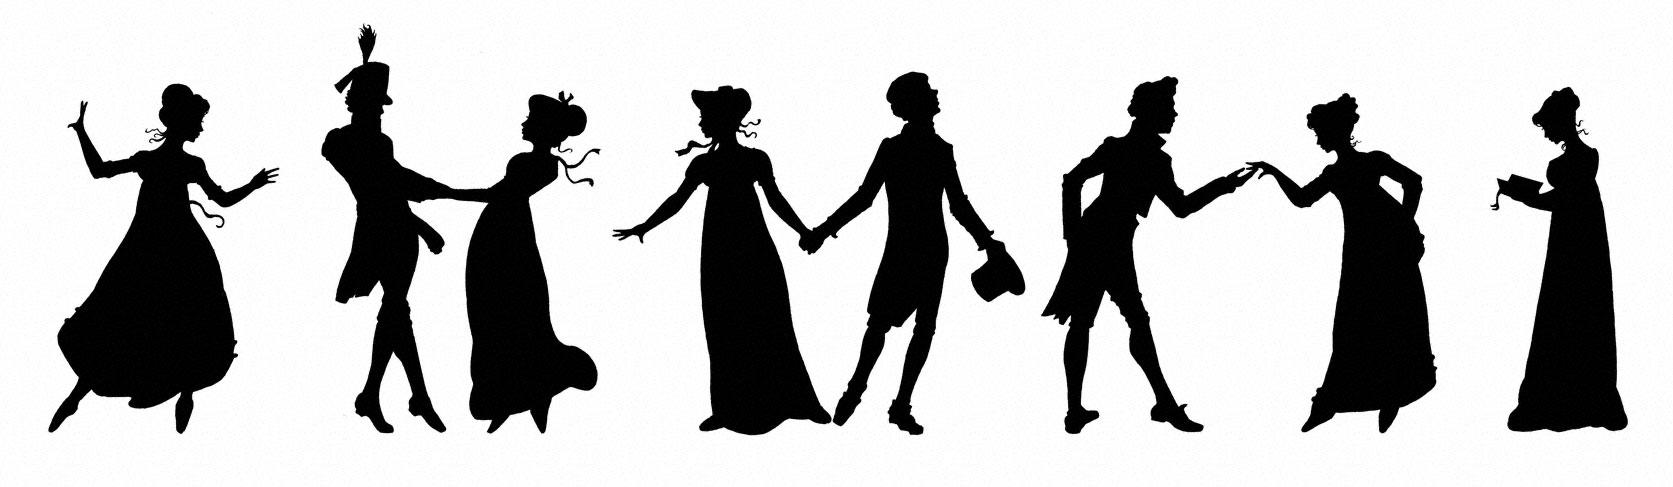 silhouette Regency figures